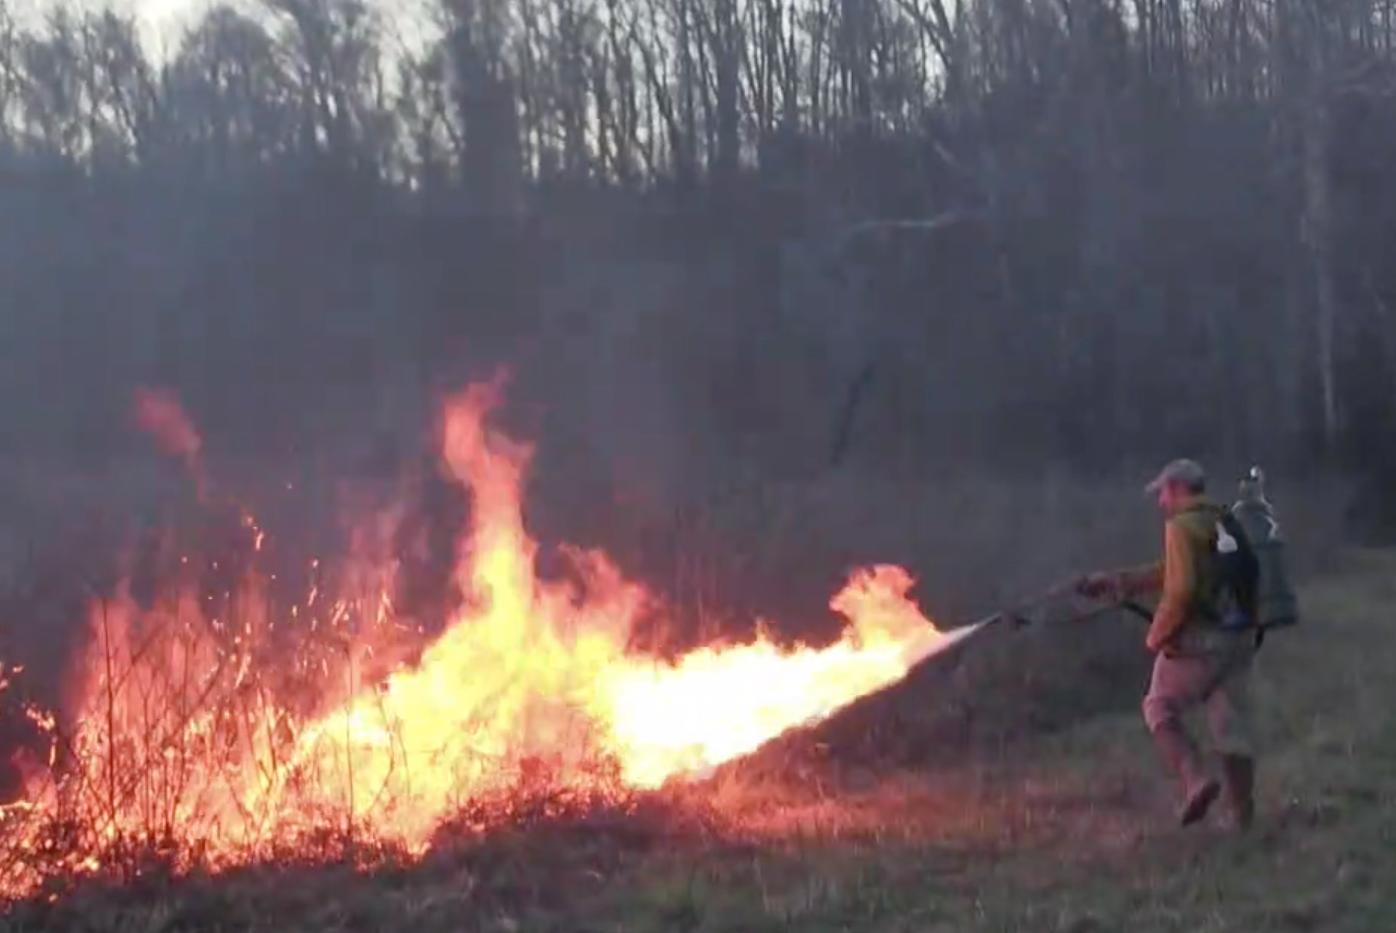 Testing the X15 Flamethrower